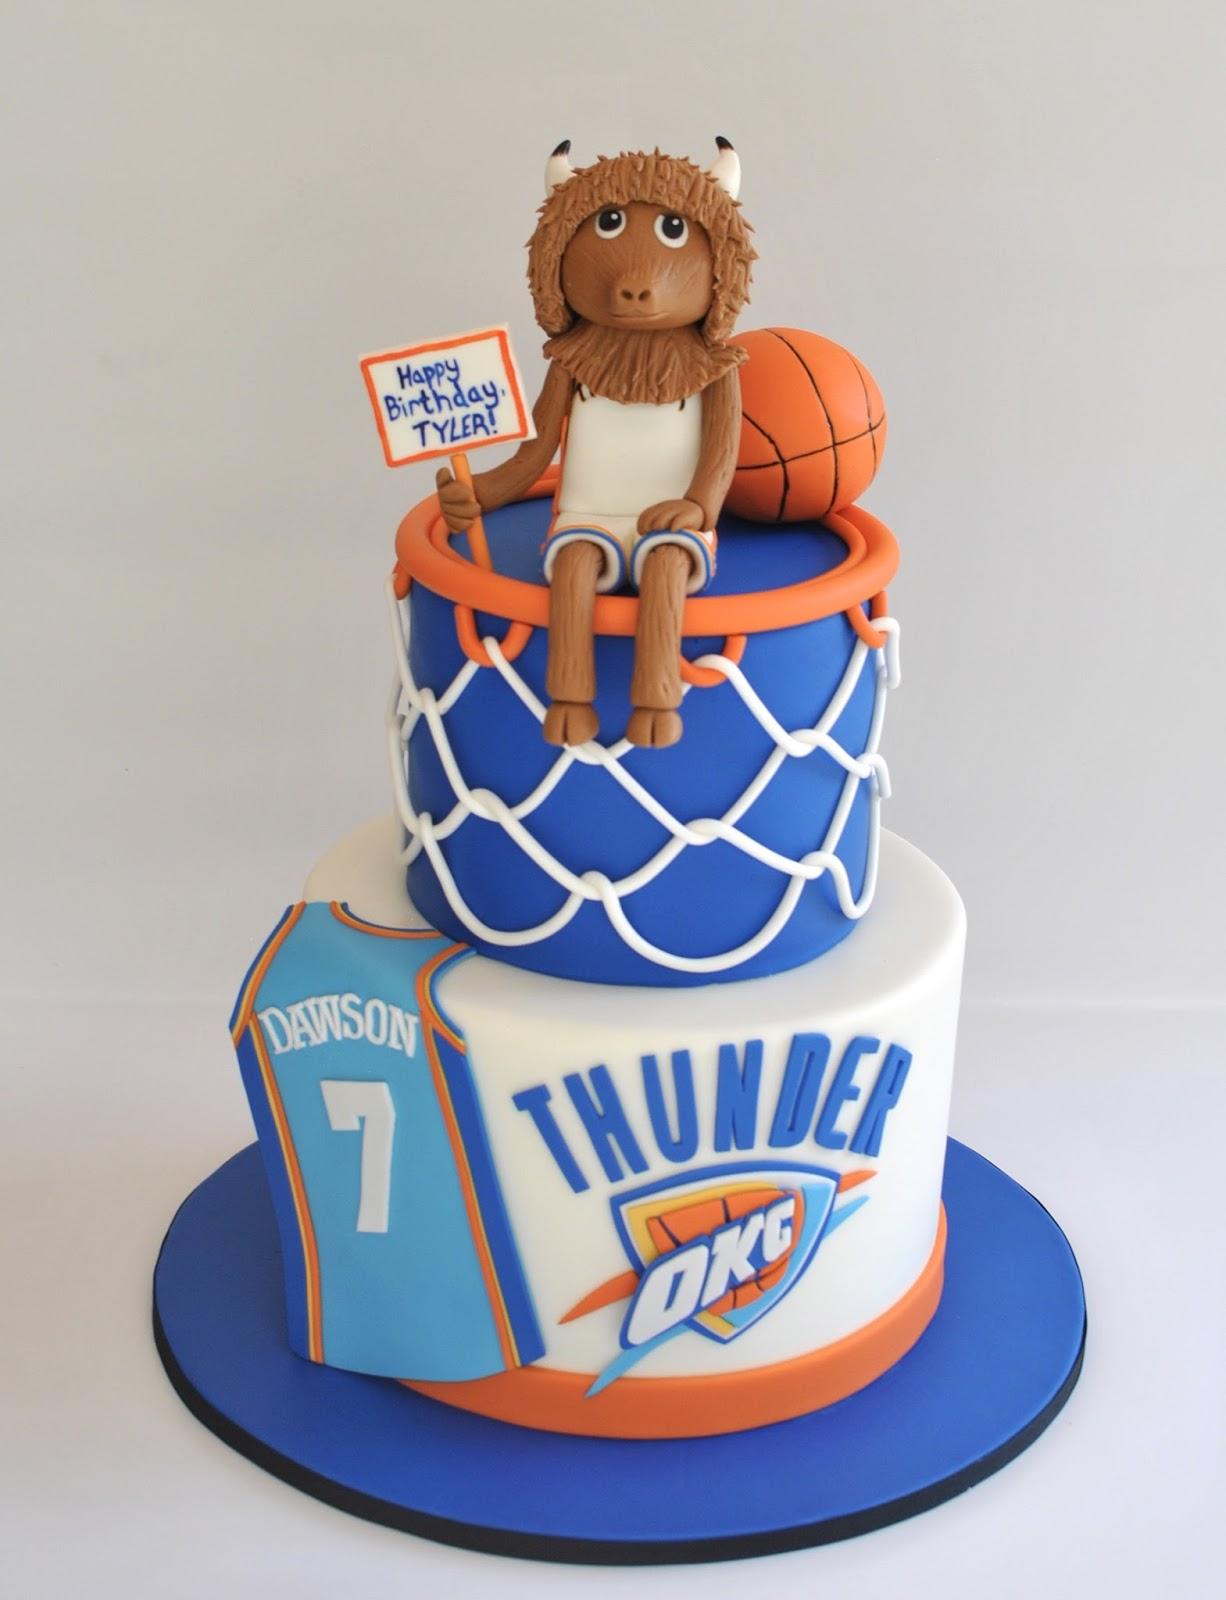 Fine Hopes Sweet Cakes September 2015 Funny Birthday Cards Online Inifofree Goldxyz